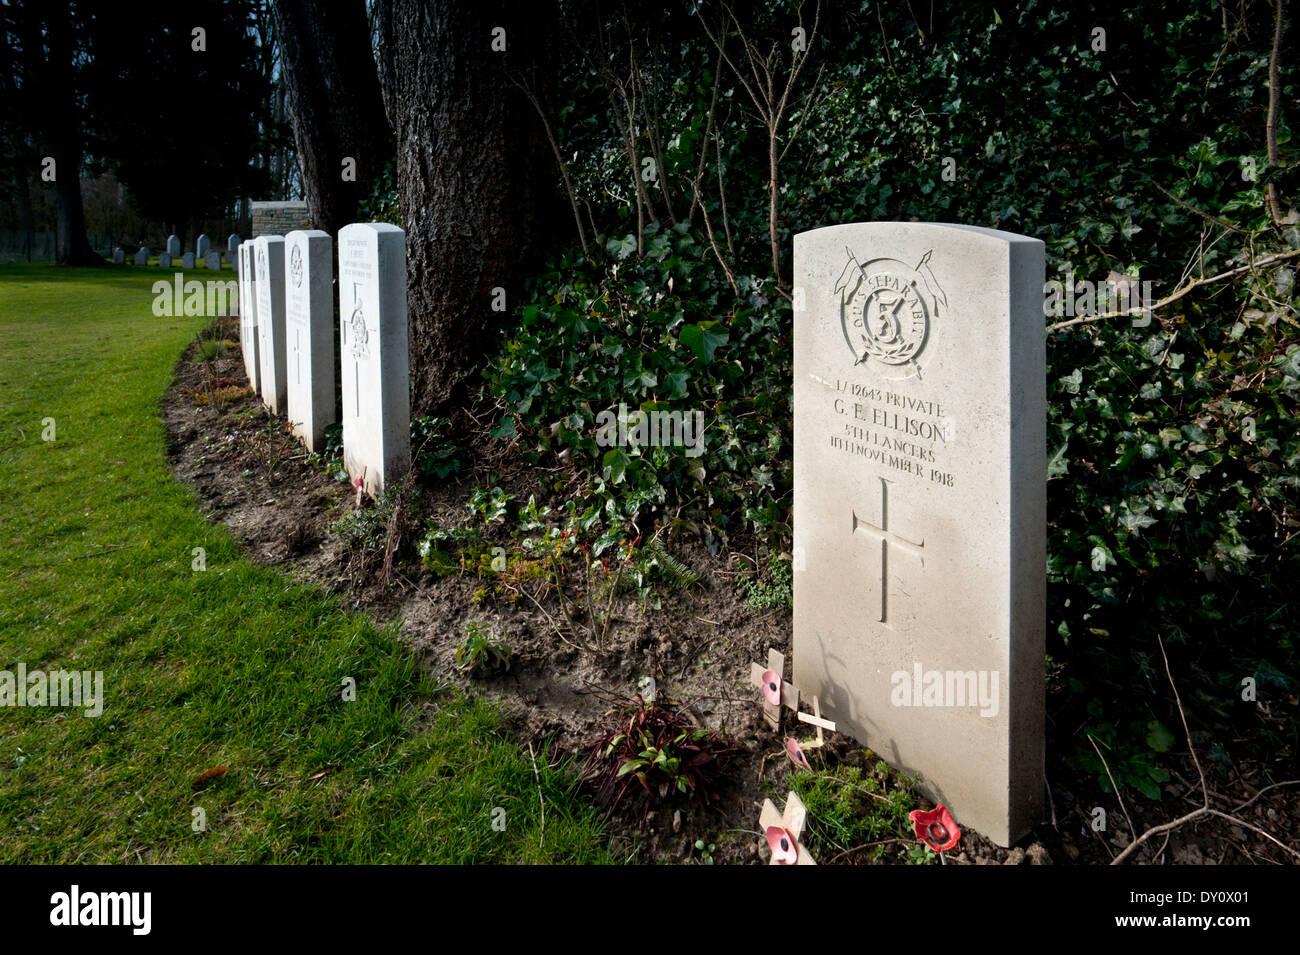 St Symphorien Military Cemetery,Mons, Belgium. February 2014 George Ellison, last British Soldier to die in WW1 ,11 Nov 1918. - Stock Image